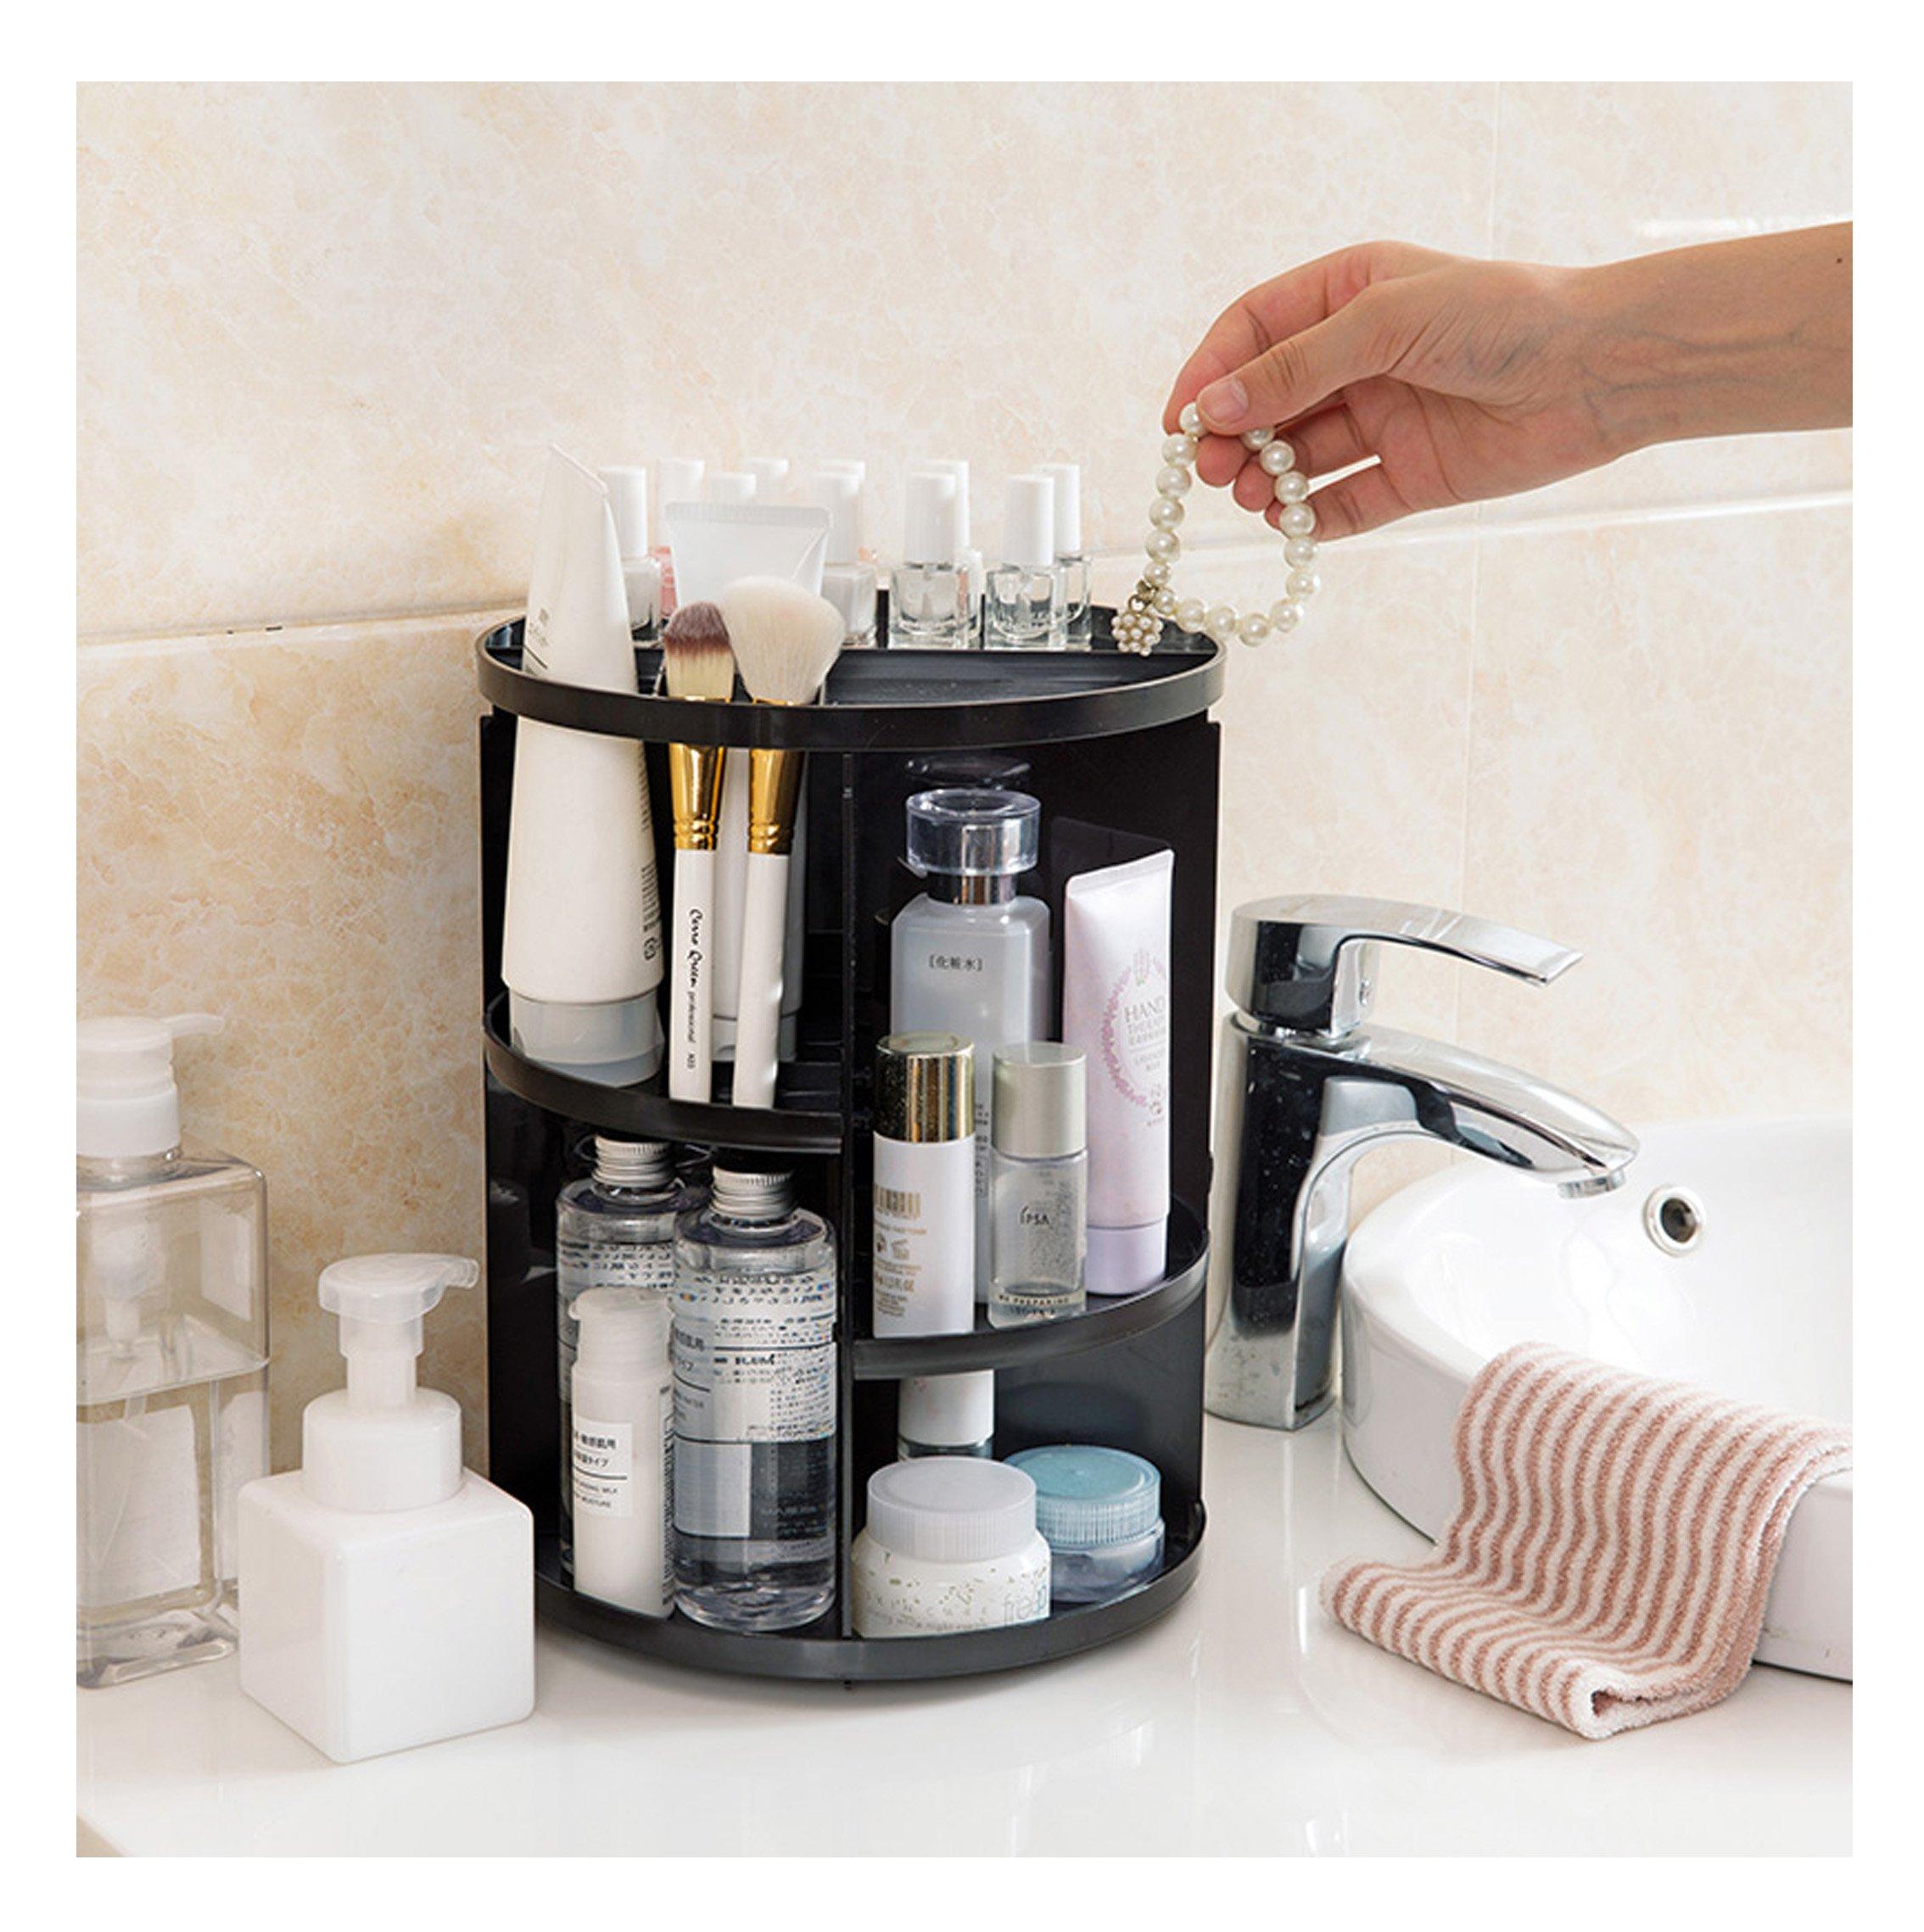 JJMG NEW 360° Rotation Table Top Make Up Organizer - Plastic Black Cosmetic Storage Case